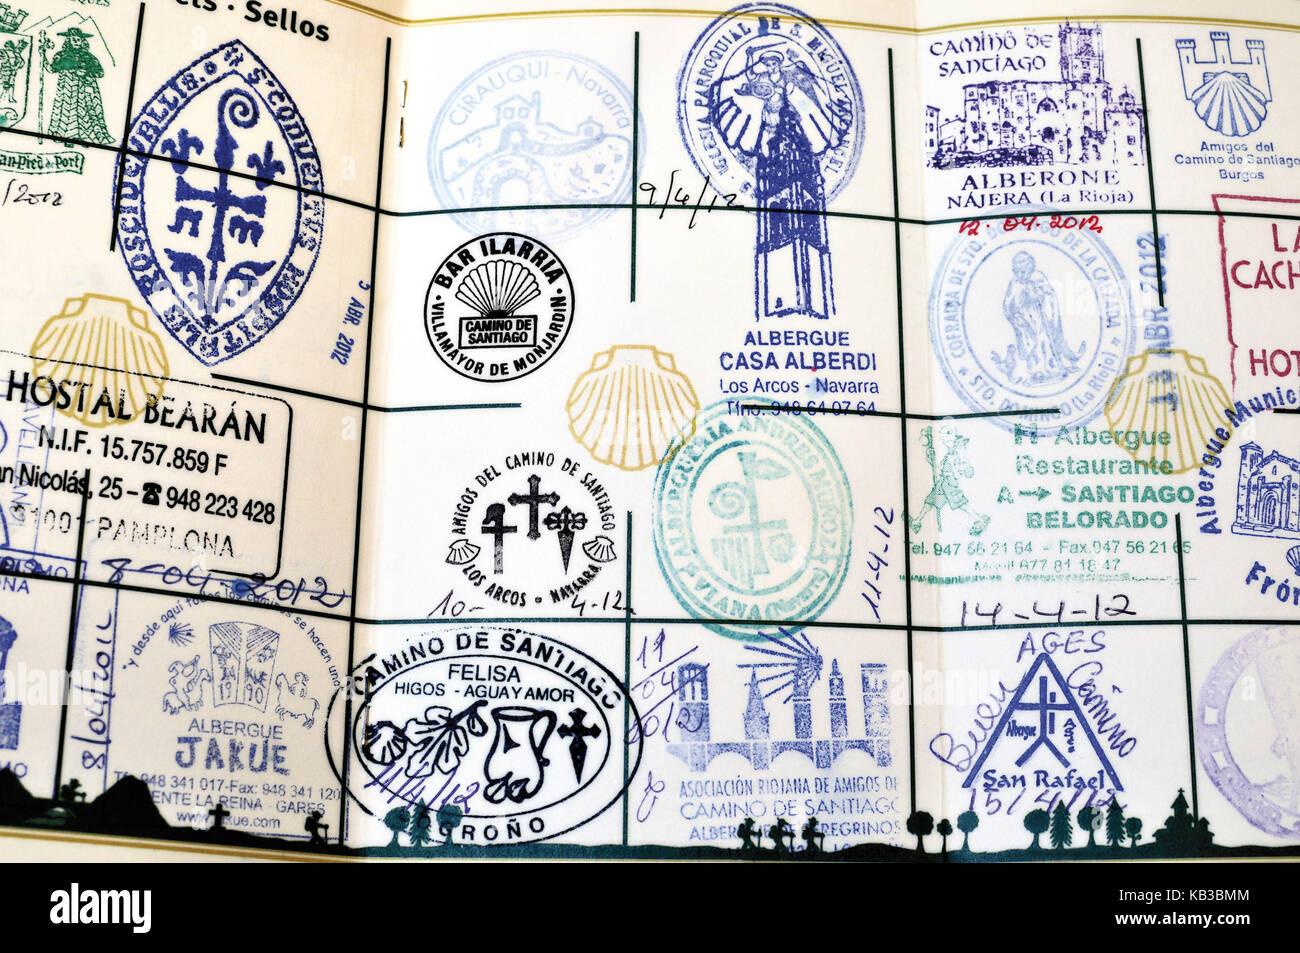 Spain, Way of St. James, stamped pilgrim's pass, - Stock Image